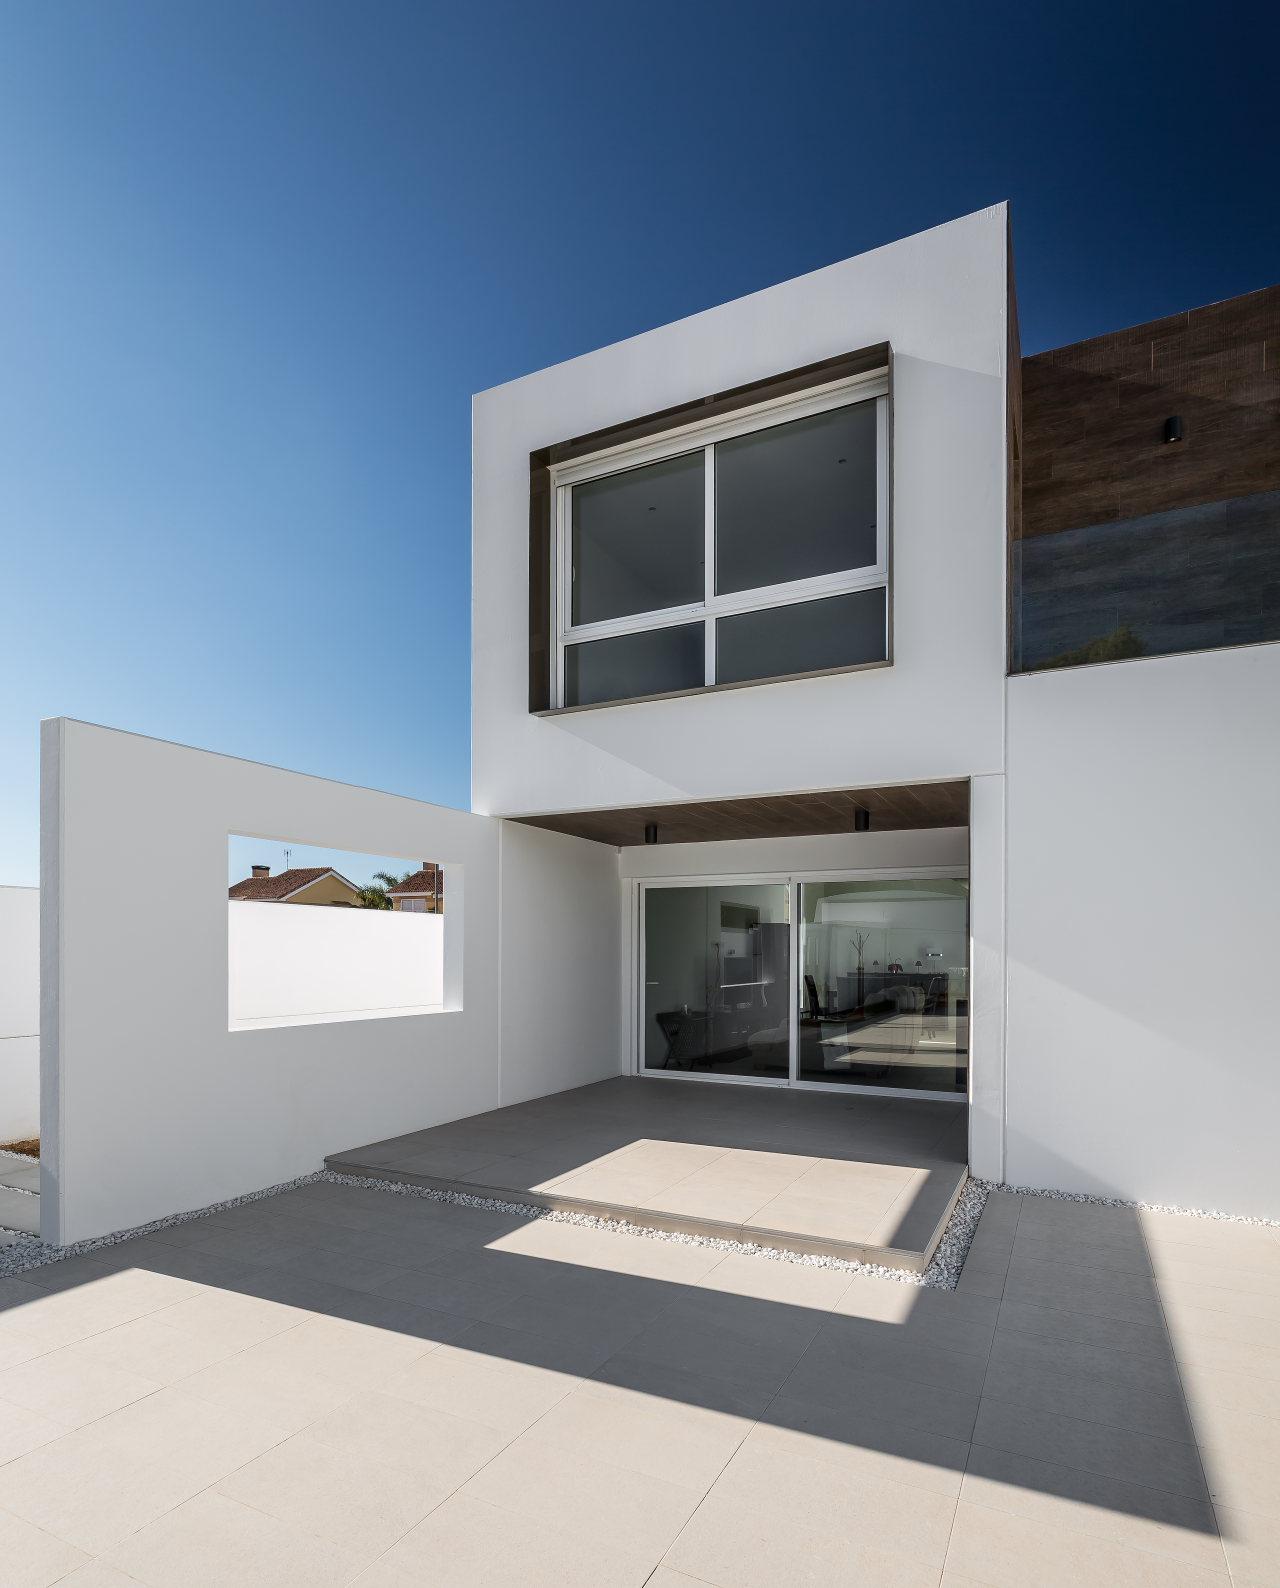 fotografia-arquitectura-valencia-german-cabo-viraje-san-antonio (8)